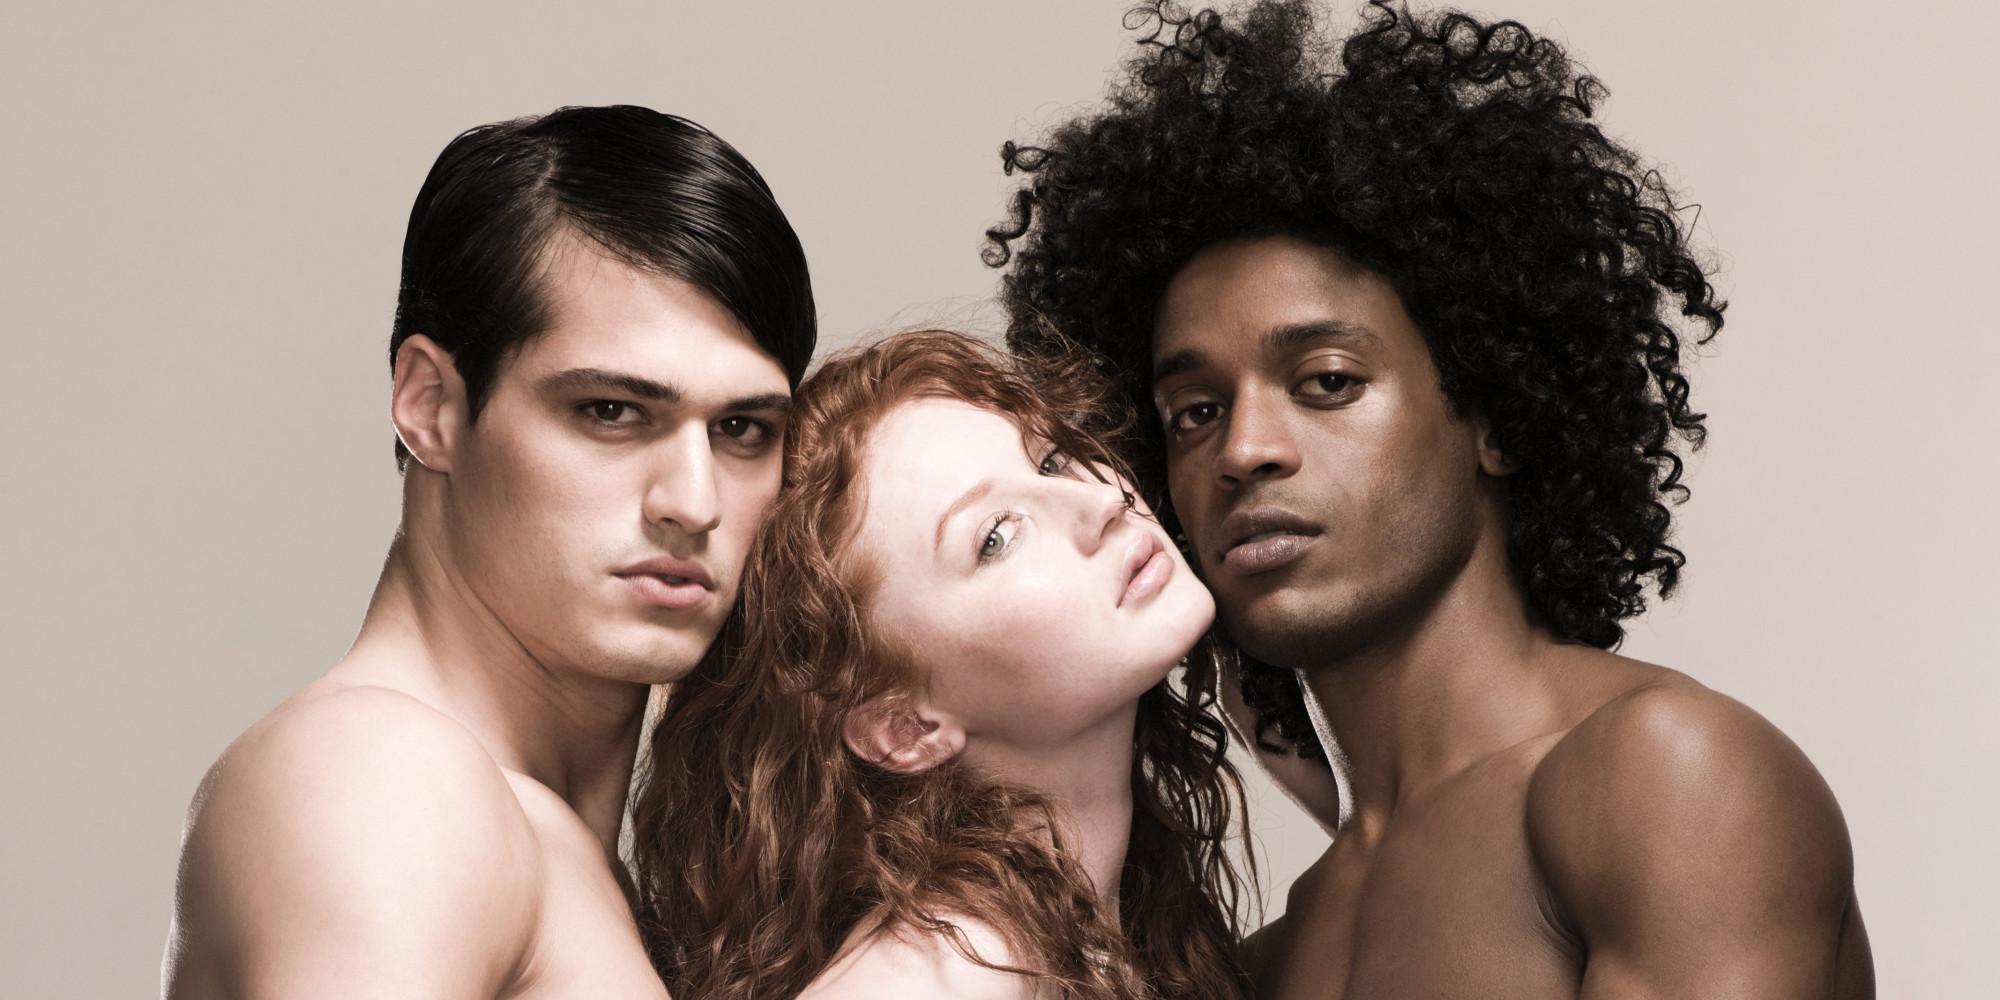 The Expanding Phenomenon Of Cuckolding: Even Gay Men Are